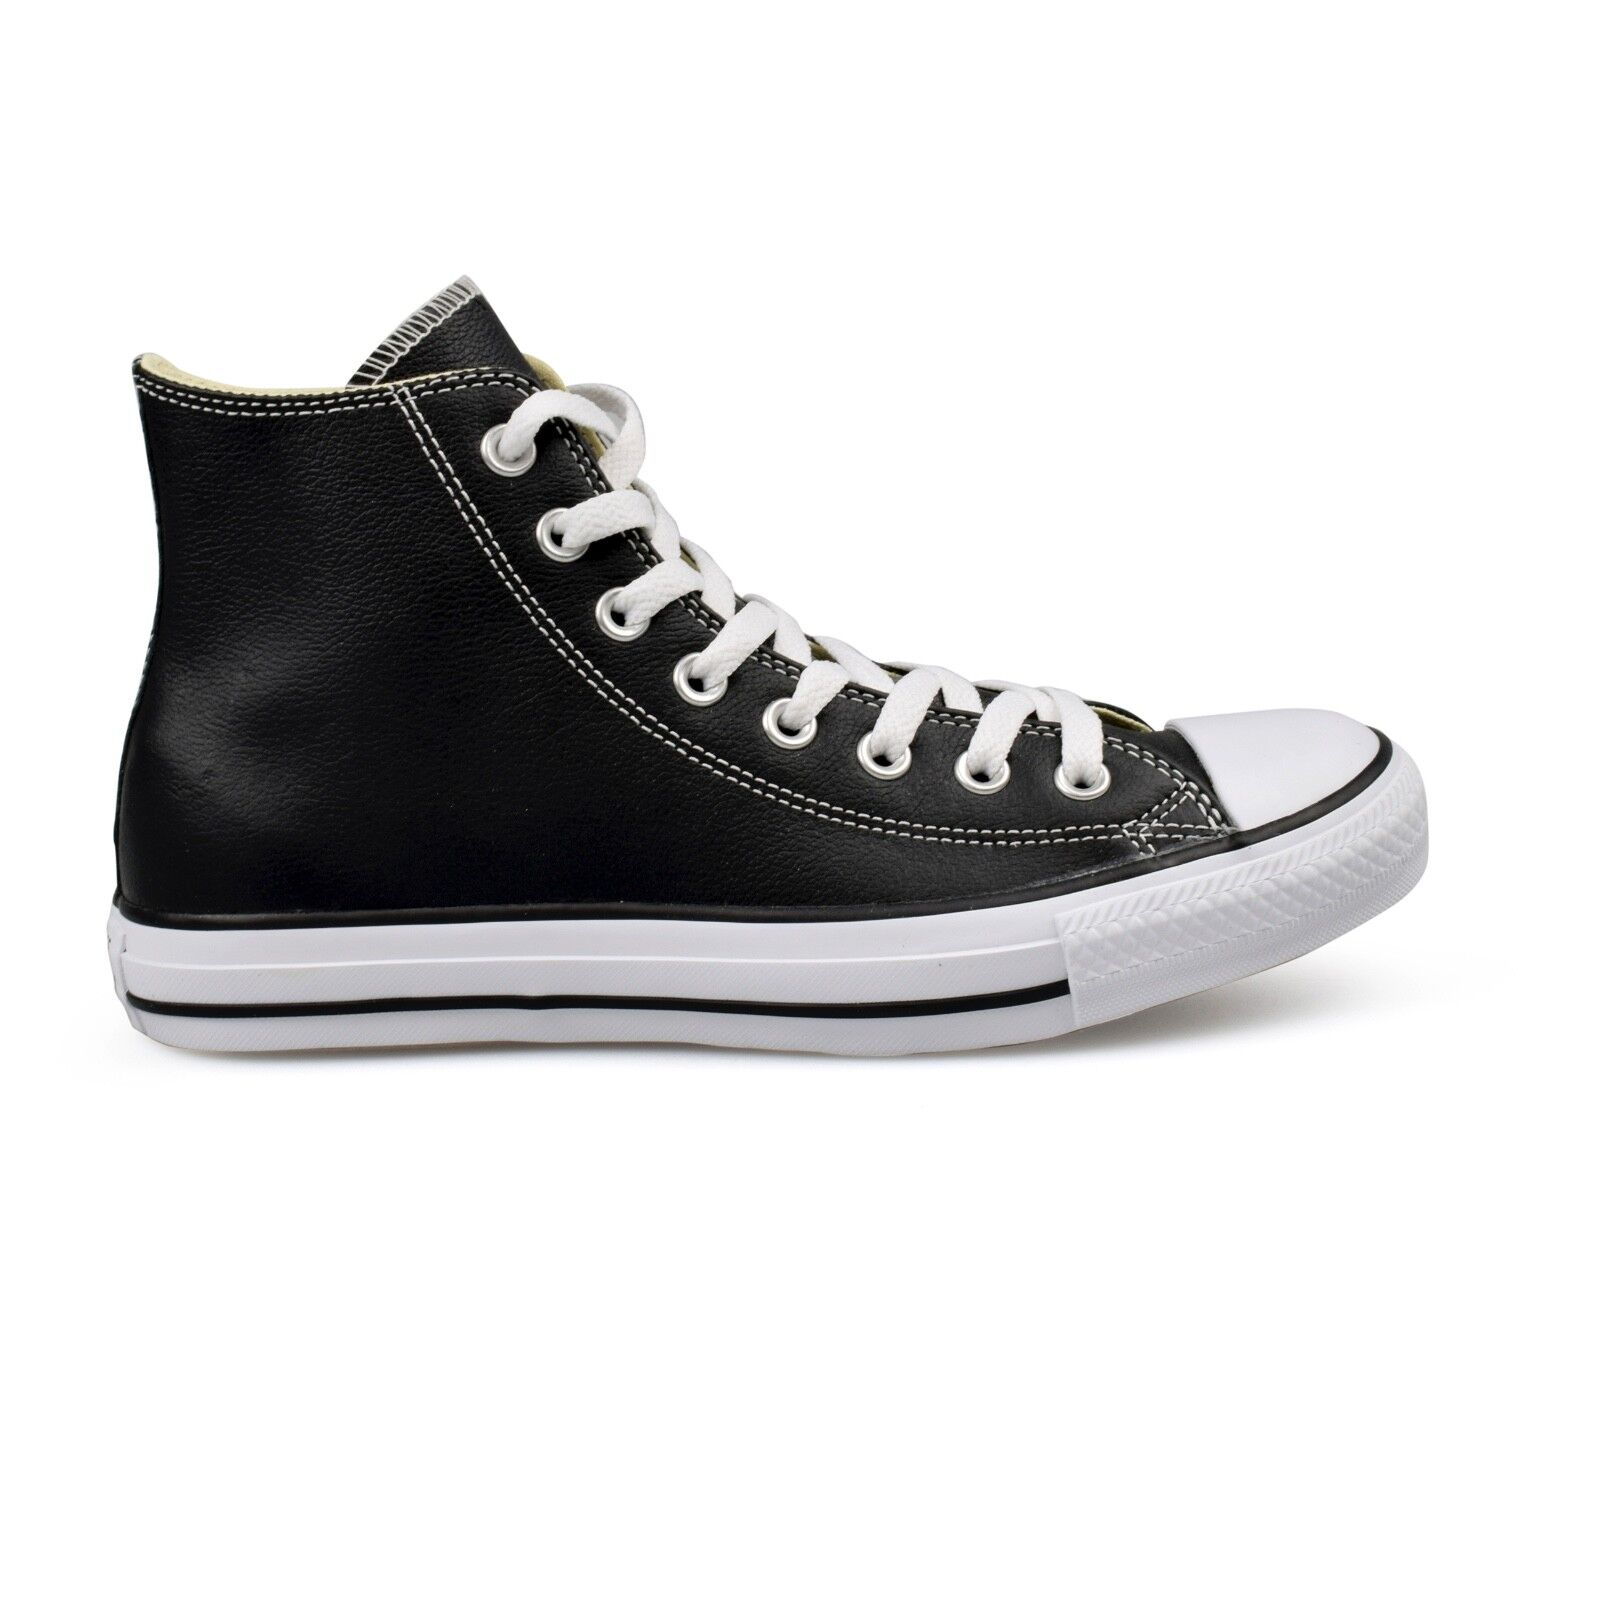 Converse Chuck Taylor All Star Cuero High Top Zapatillas Zapatillas Zapatillas Unisex Negro Nuevo  elige tu favorito